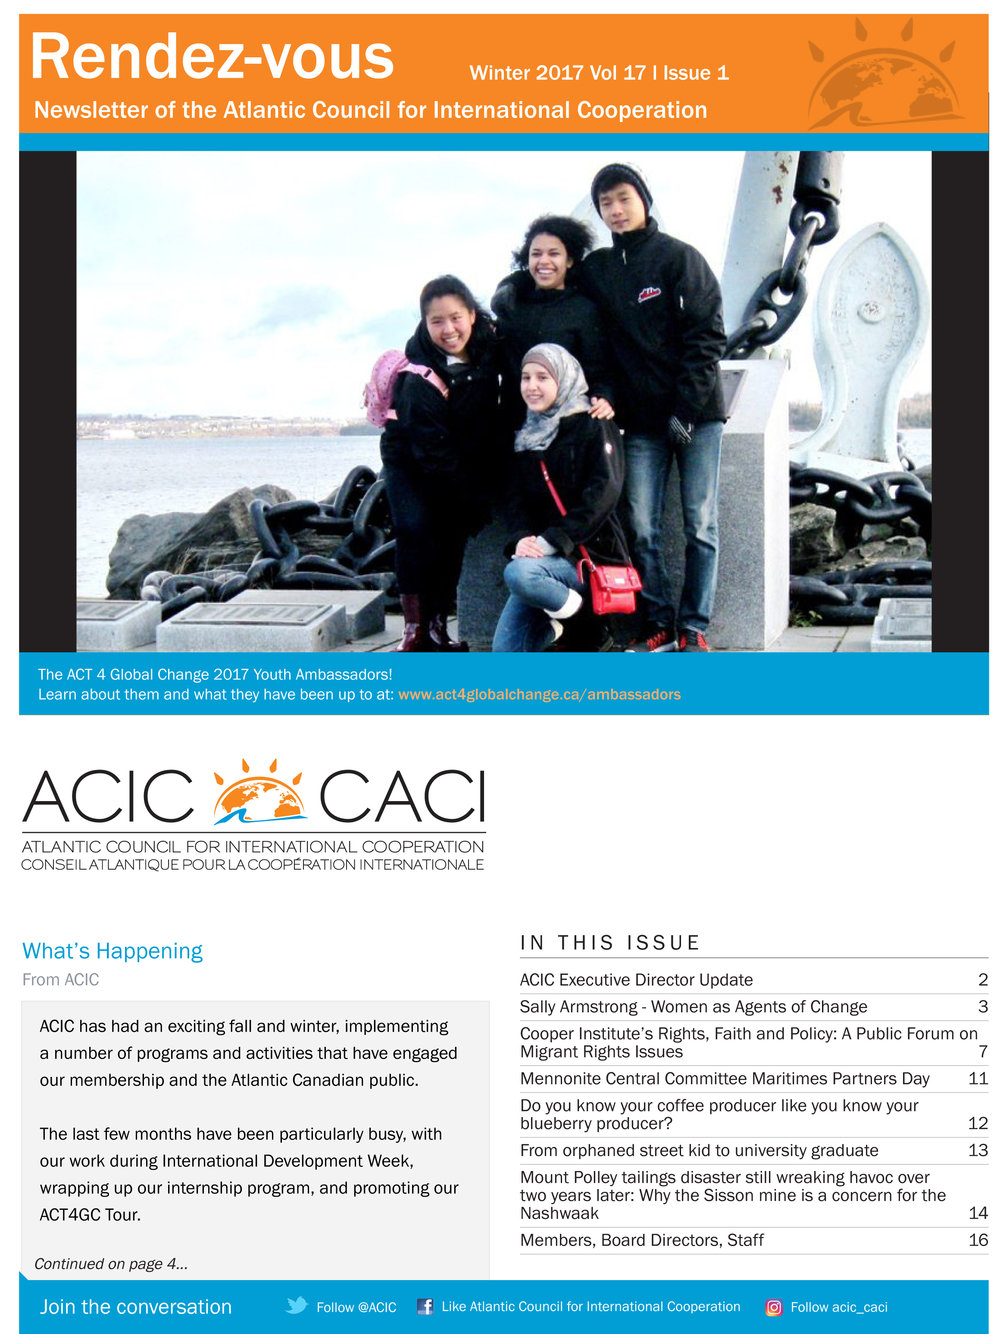 ACIC Rendez-vous Winter 2017-cover.jpg